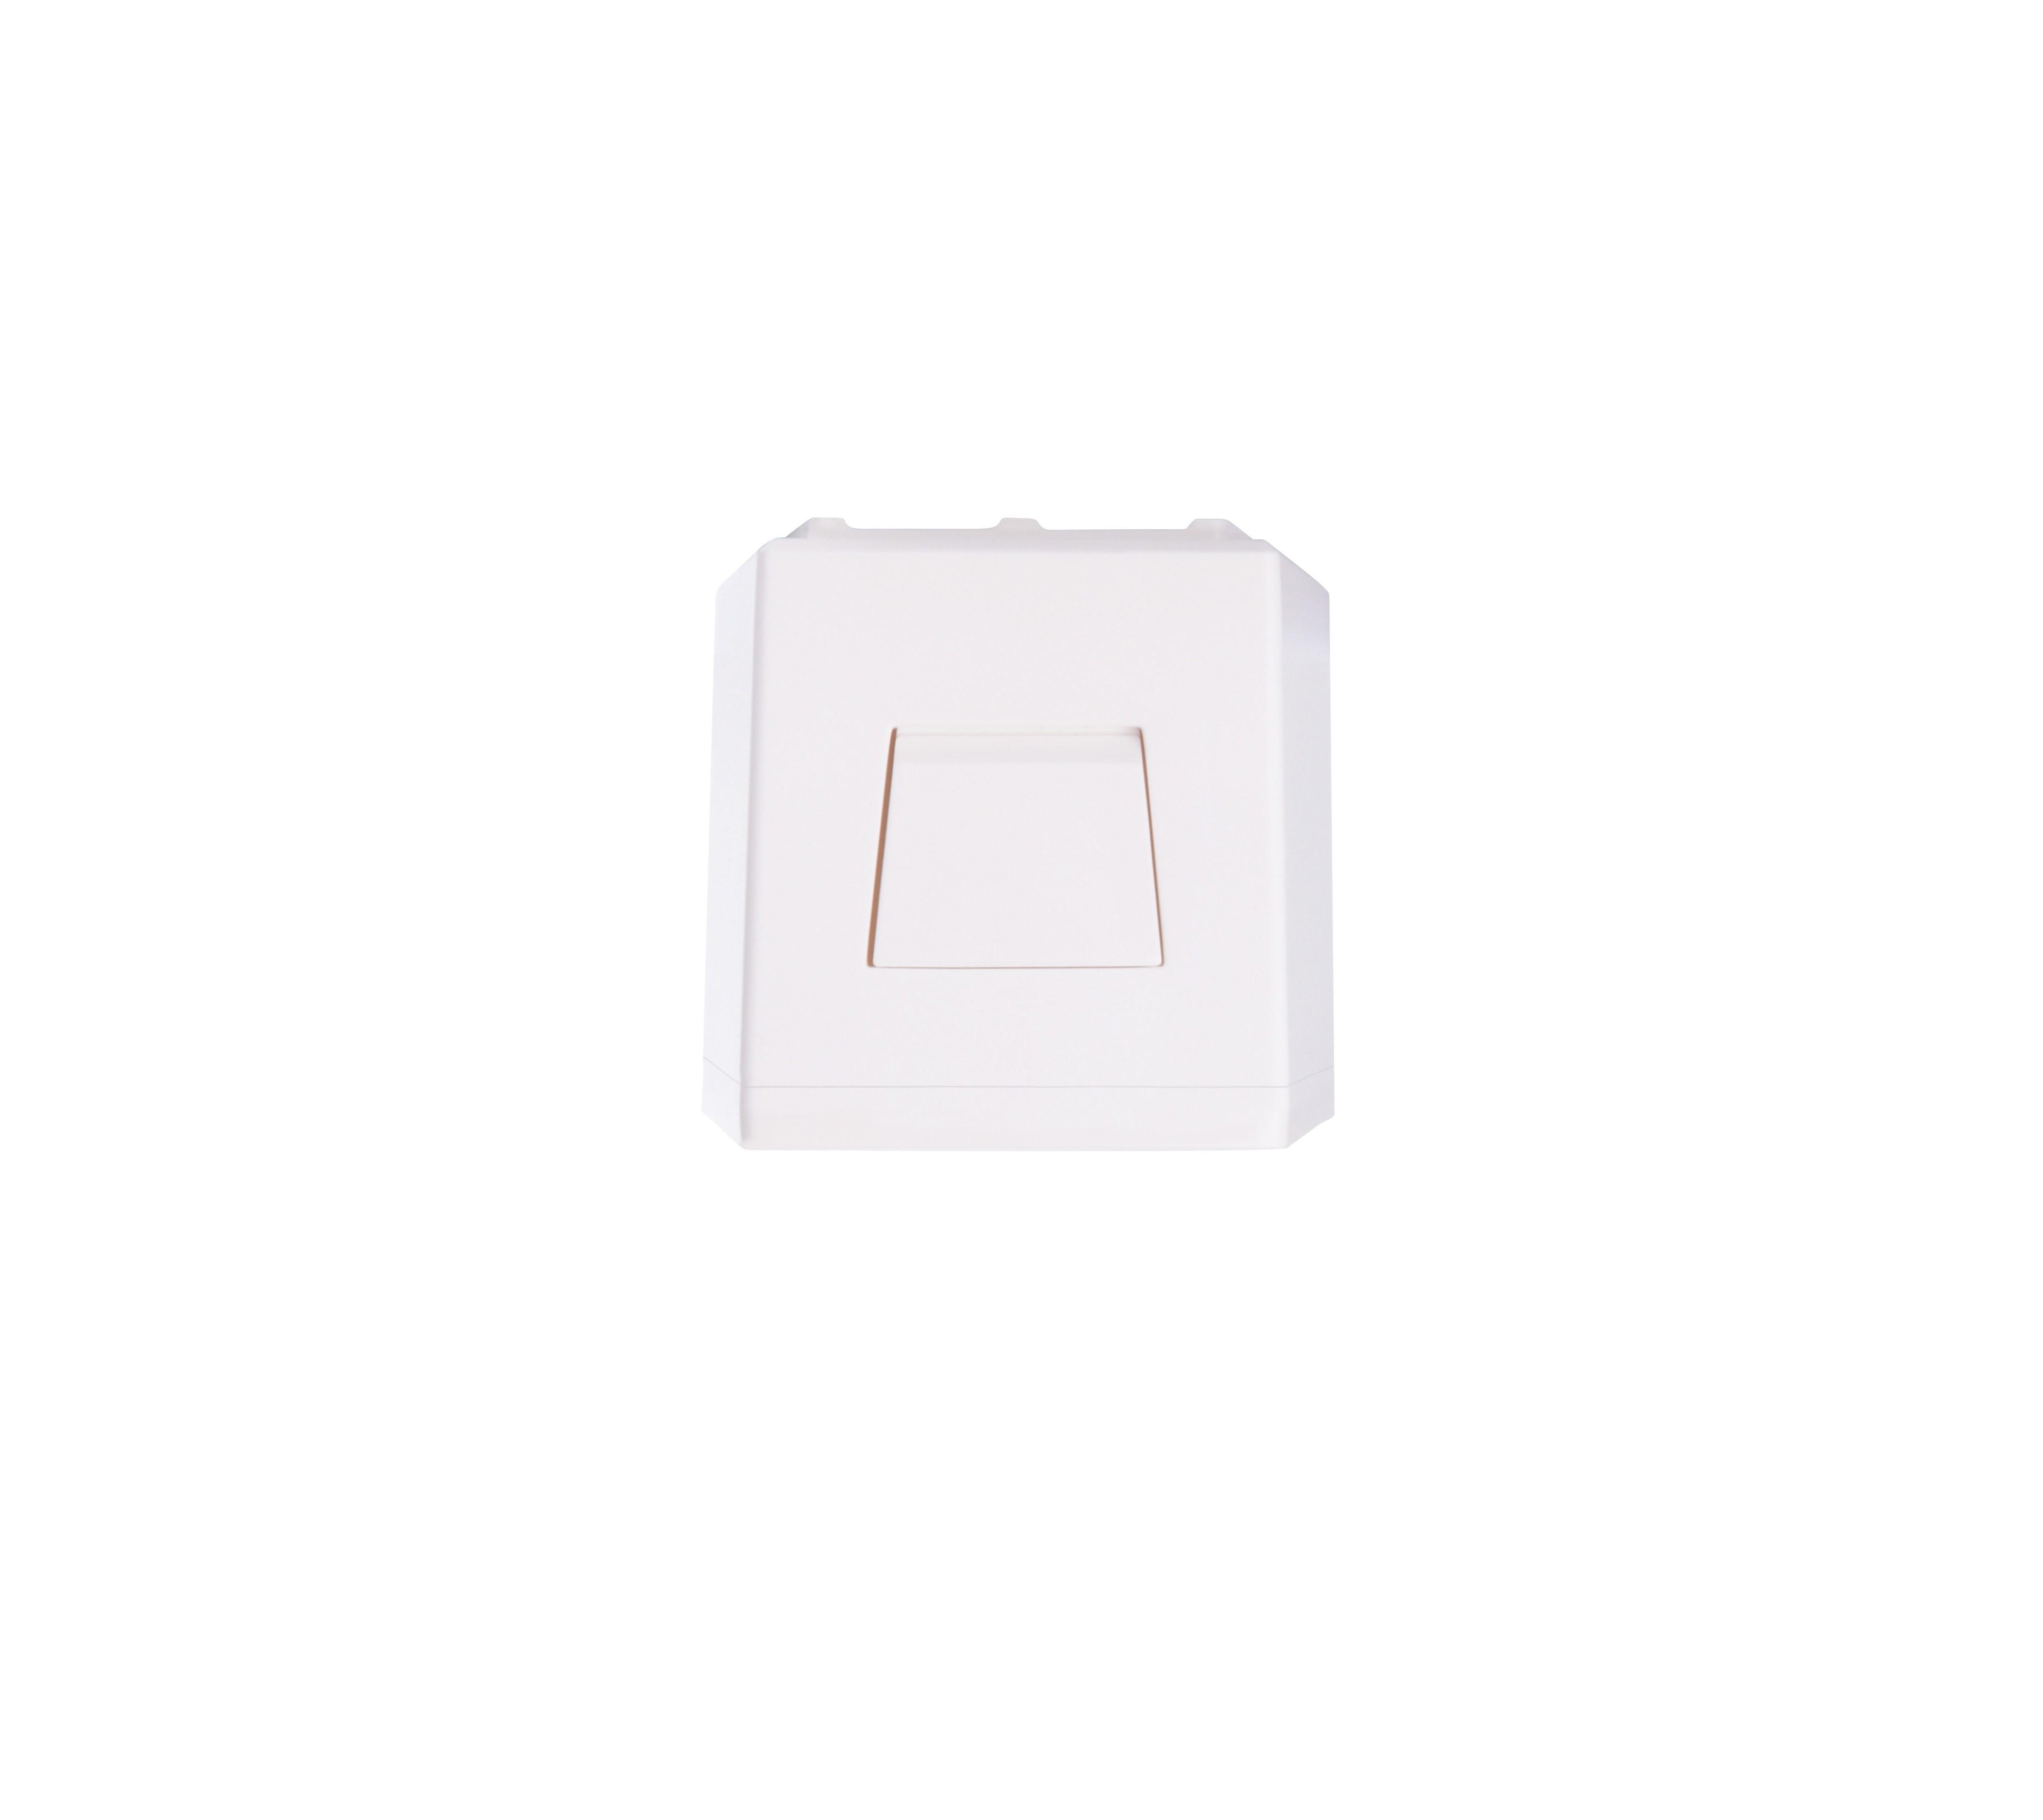 Lampa emergenta led Intelight 94702   3h mentinut test automat 1